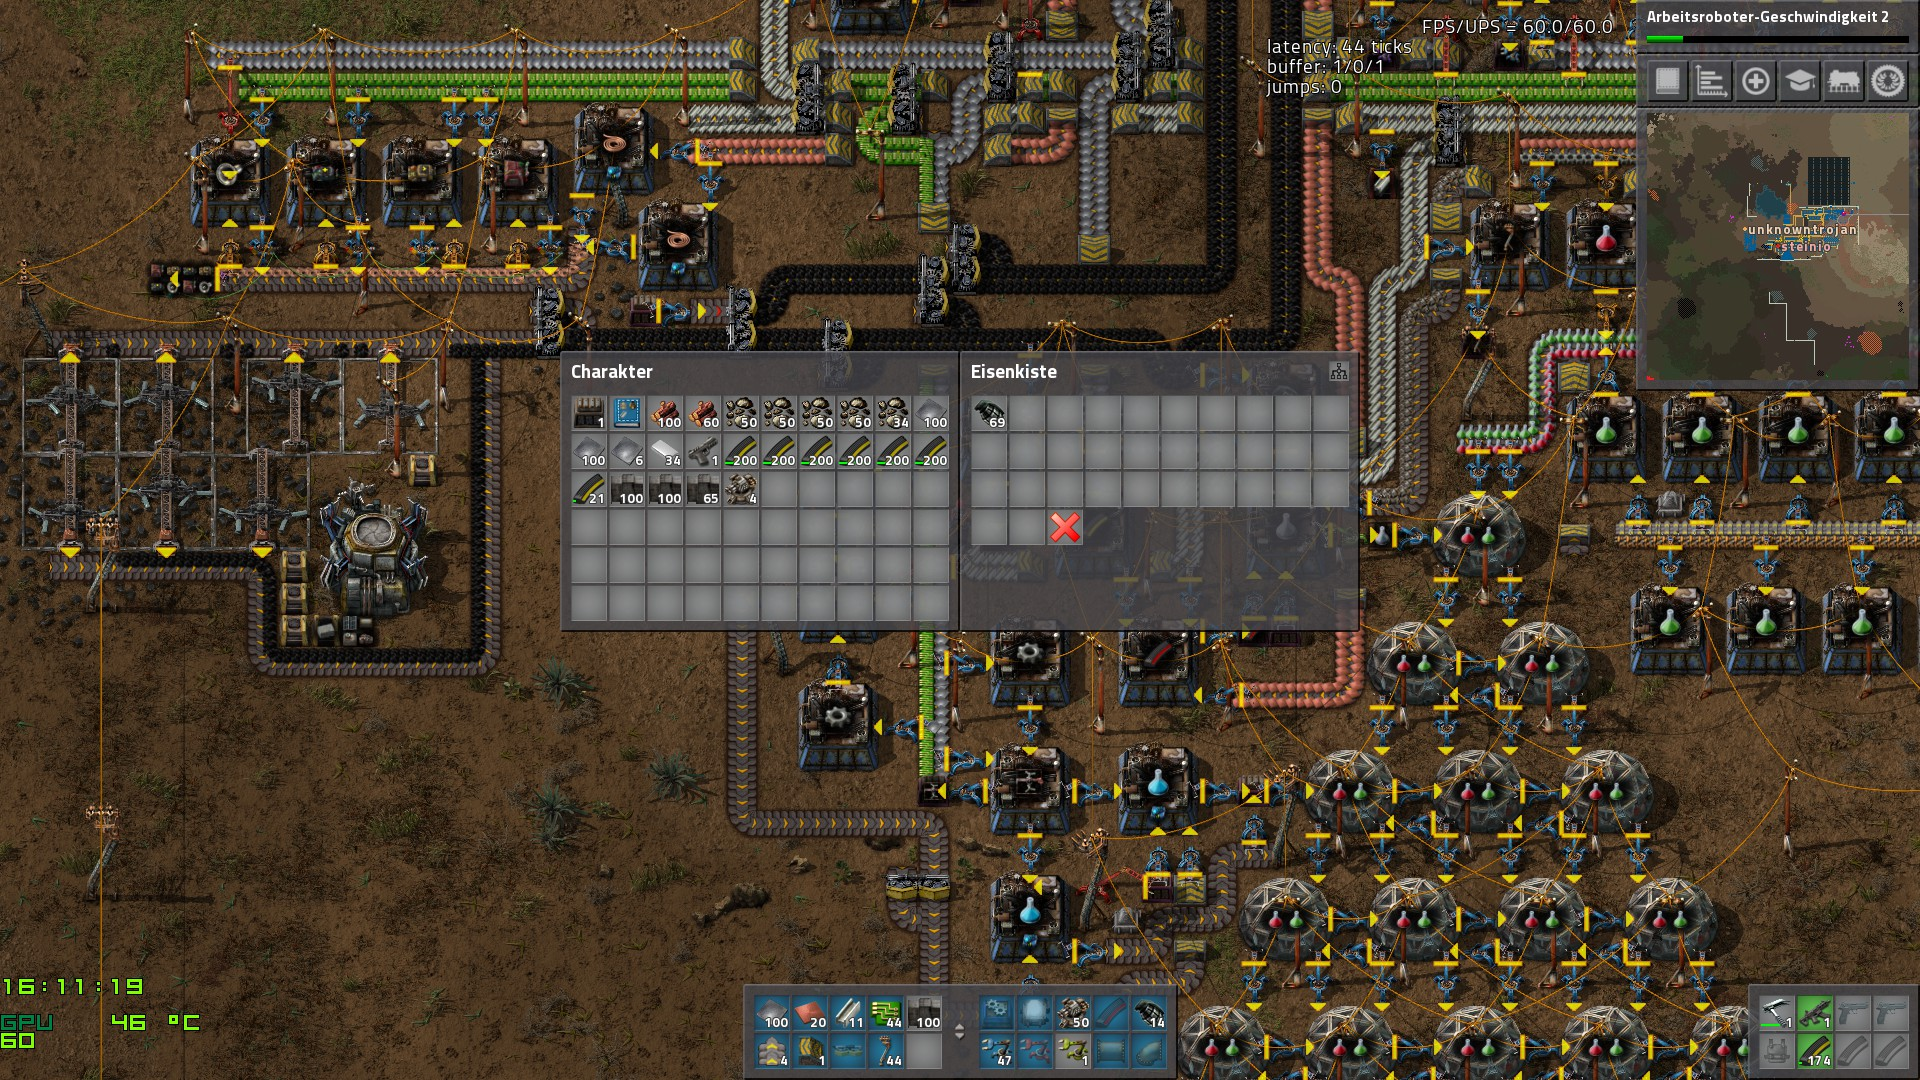 kovarex] [0 16 16] Crash in multiplayer on manual inventory sorting